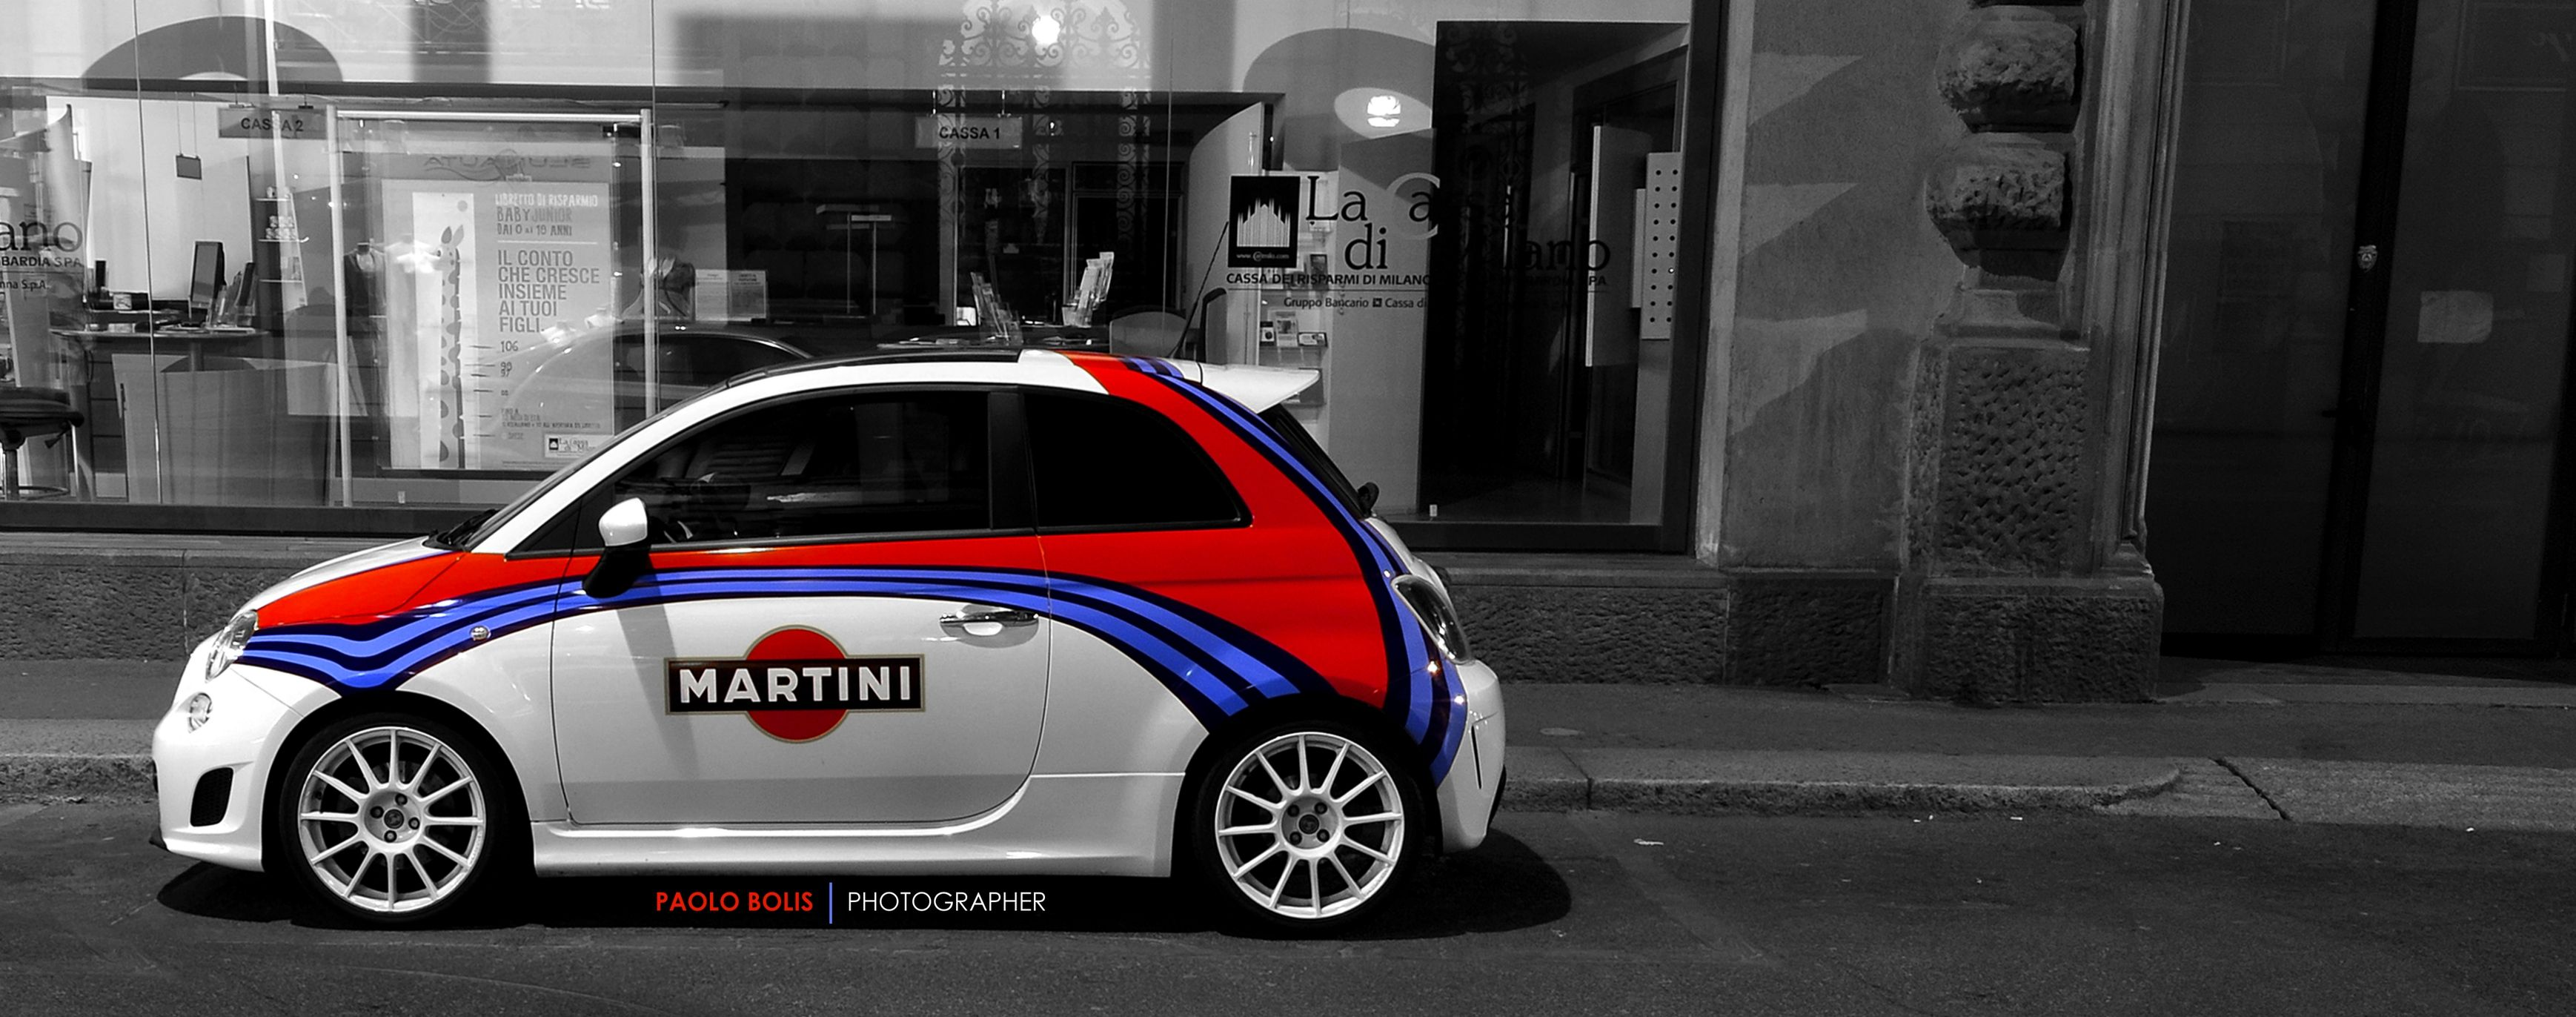 Fiat500 Martini Fiat 500 Fiat Abarth Fahrzeugbeschriftung